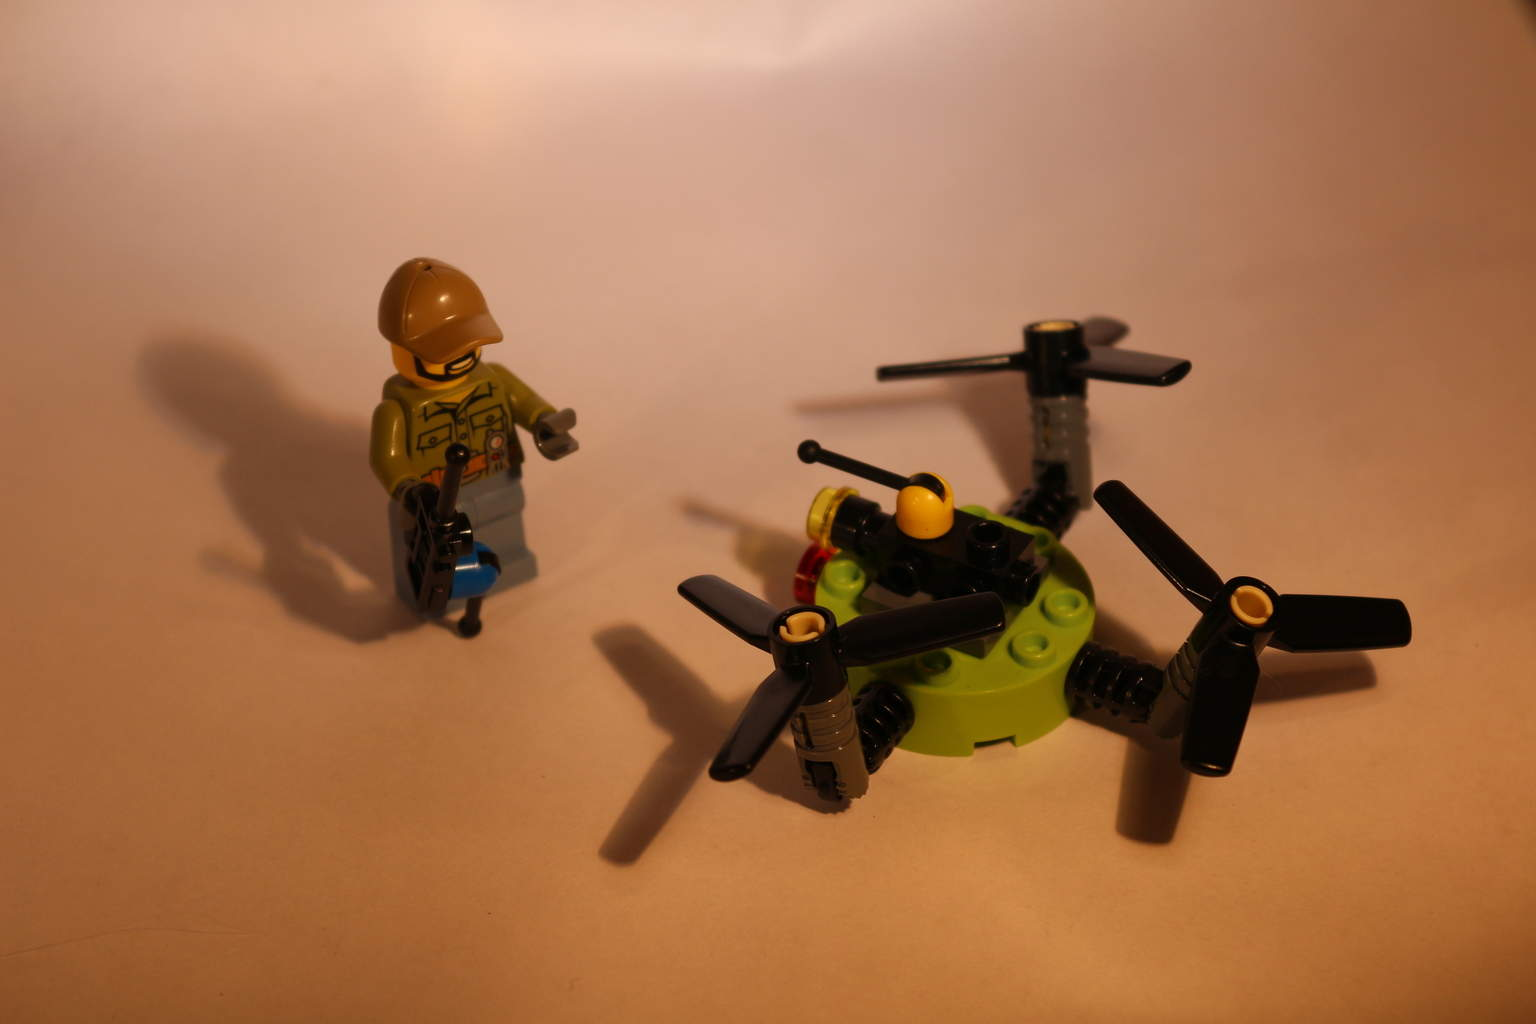 lego city drone and mini fig